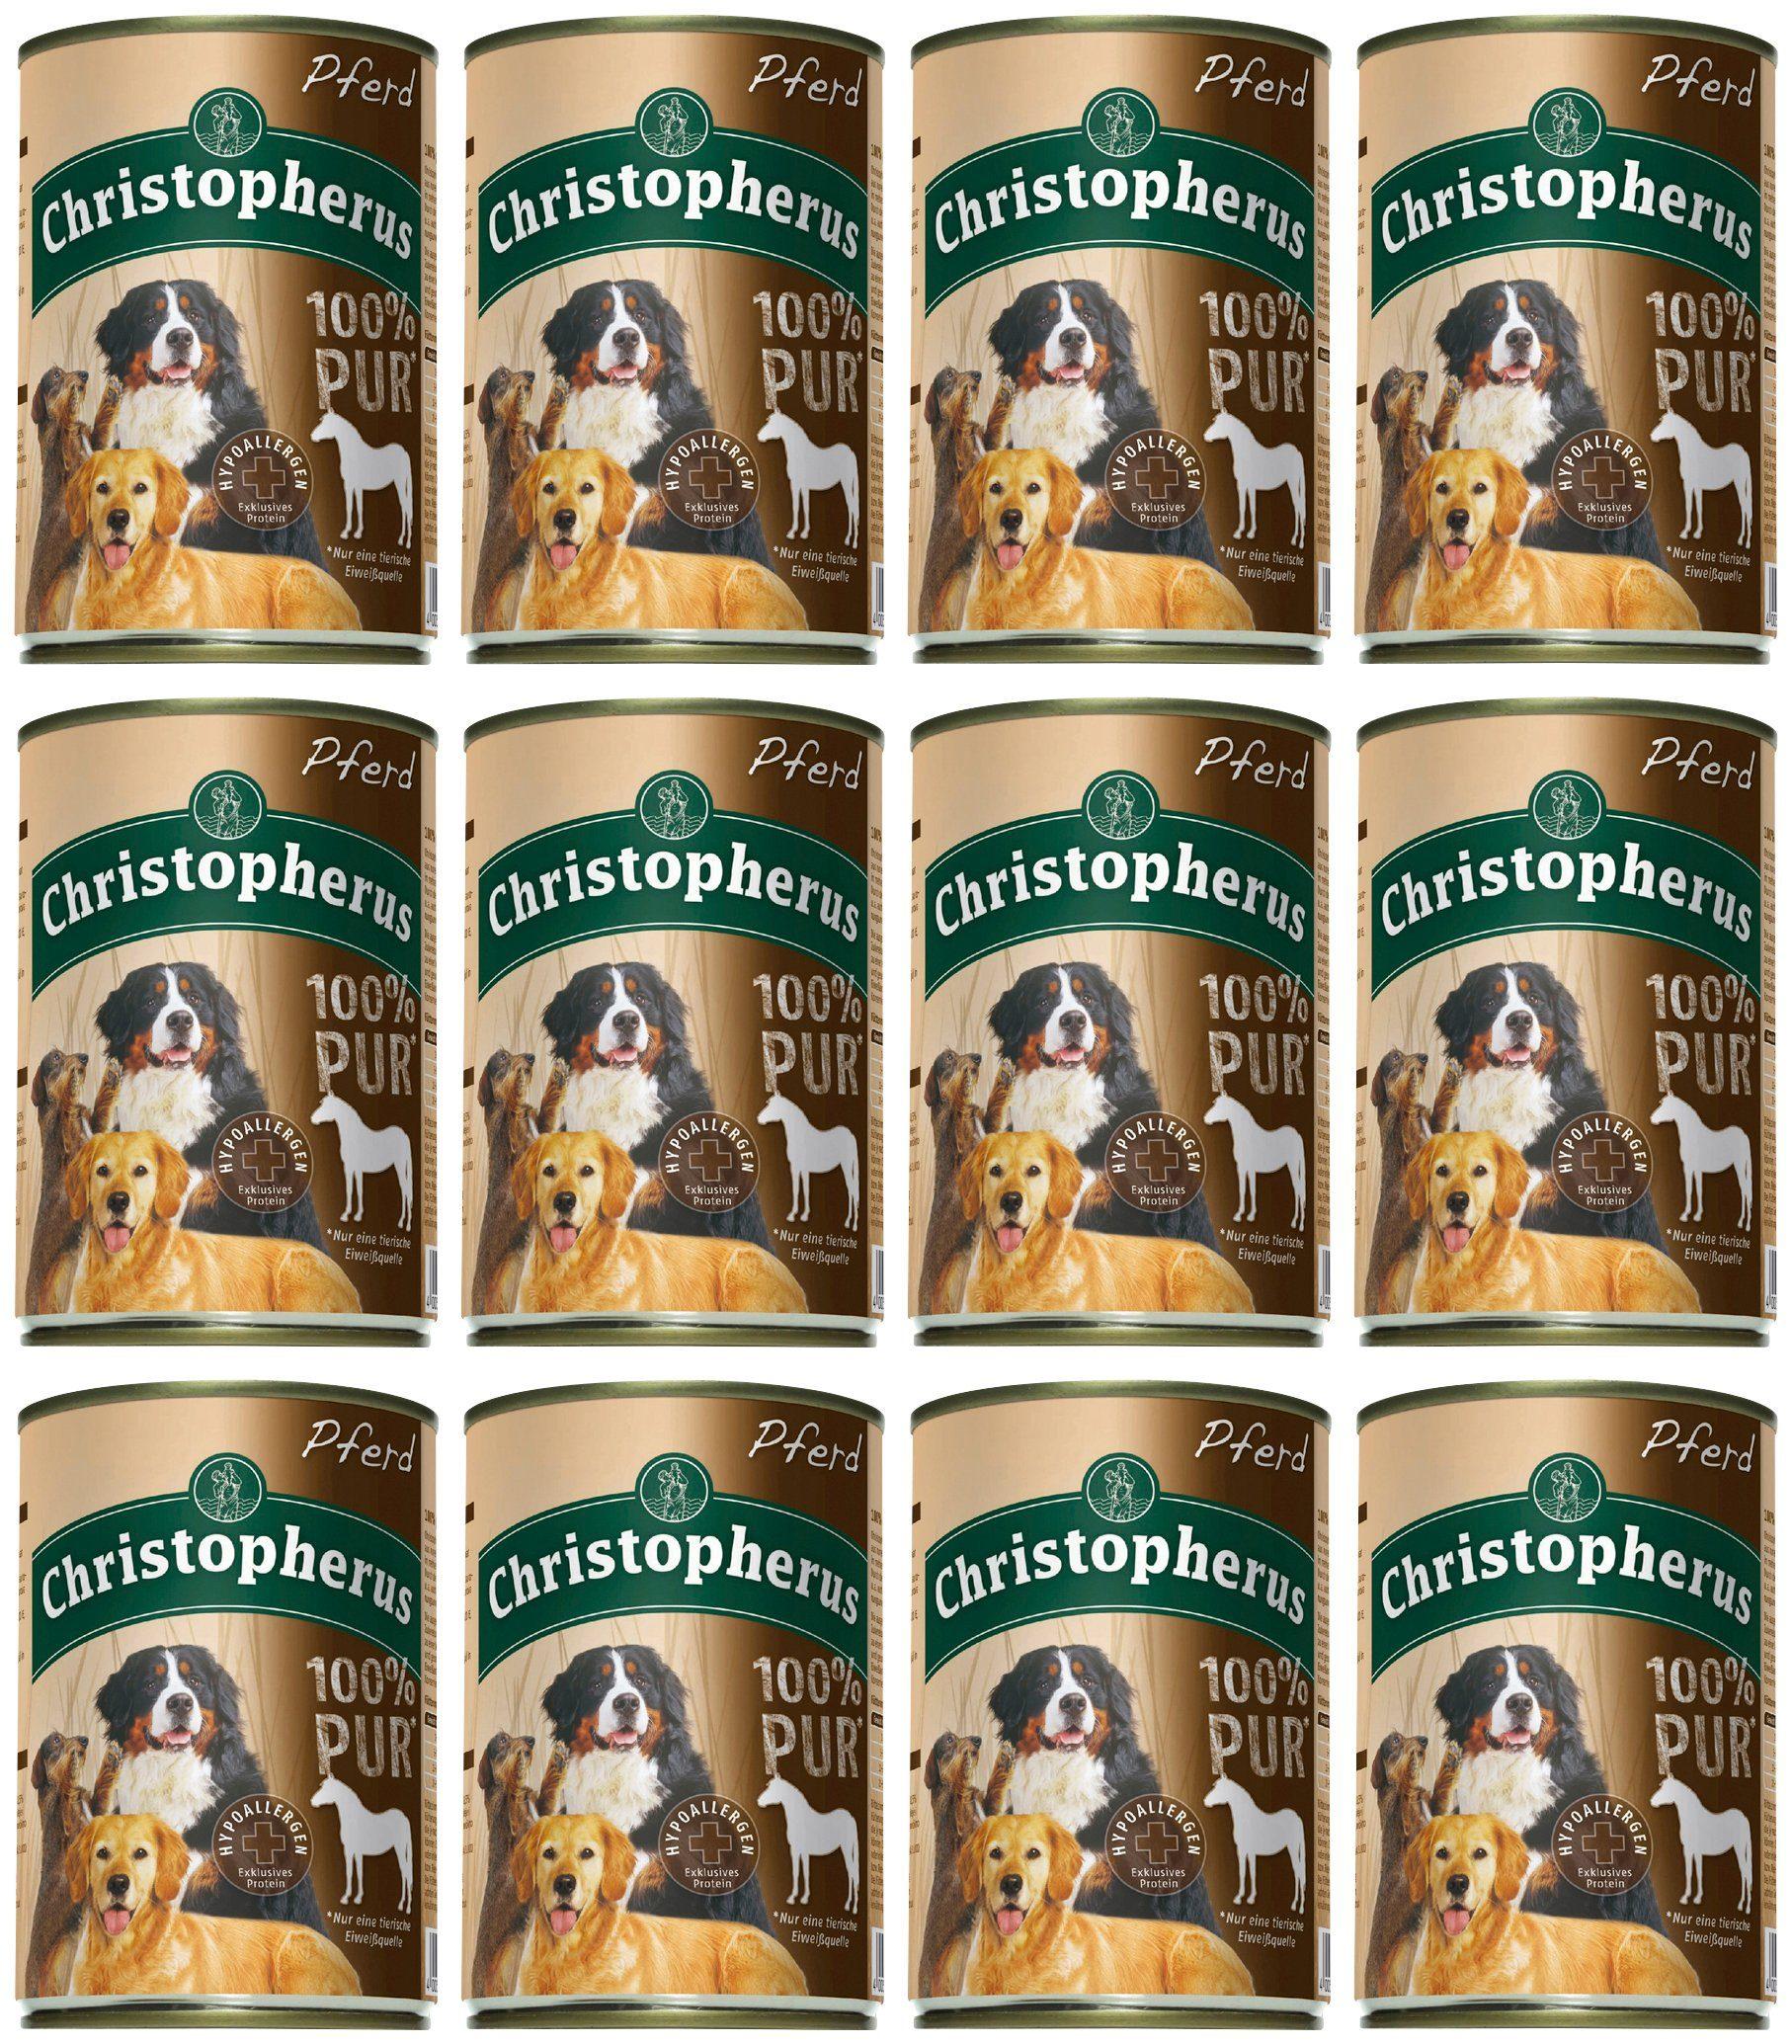 Christopherus Hundenassfutter »100% PUR Pferd«, 12 Dosen á 400 g